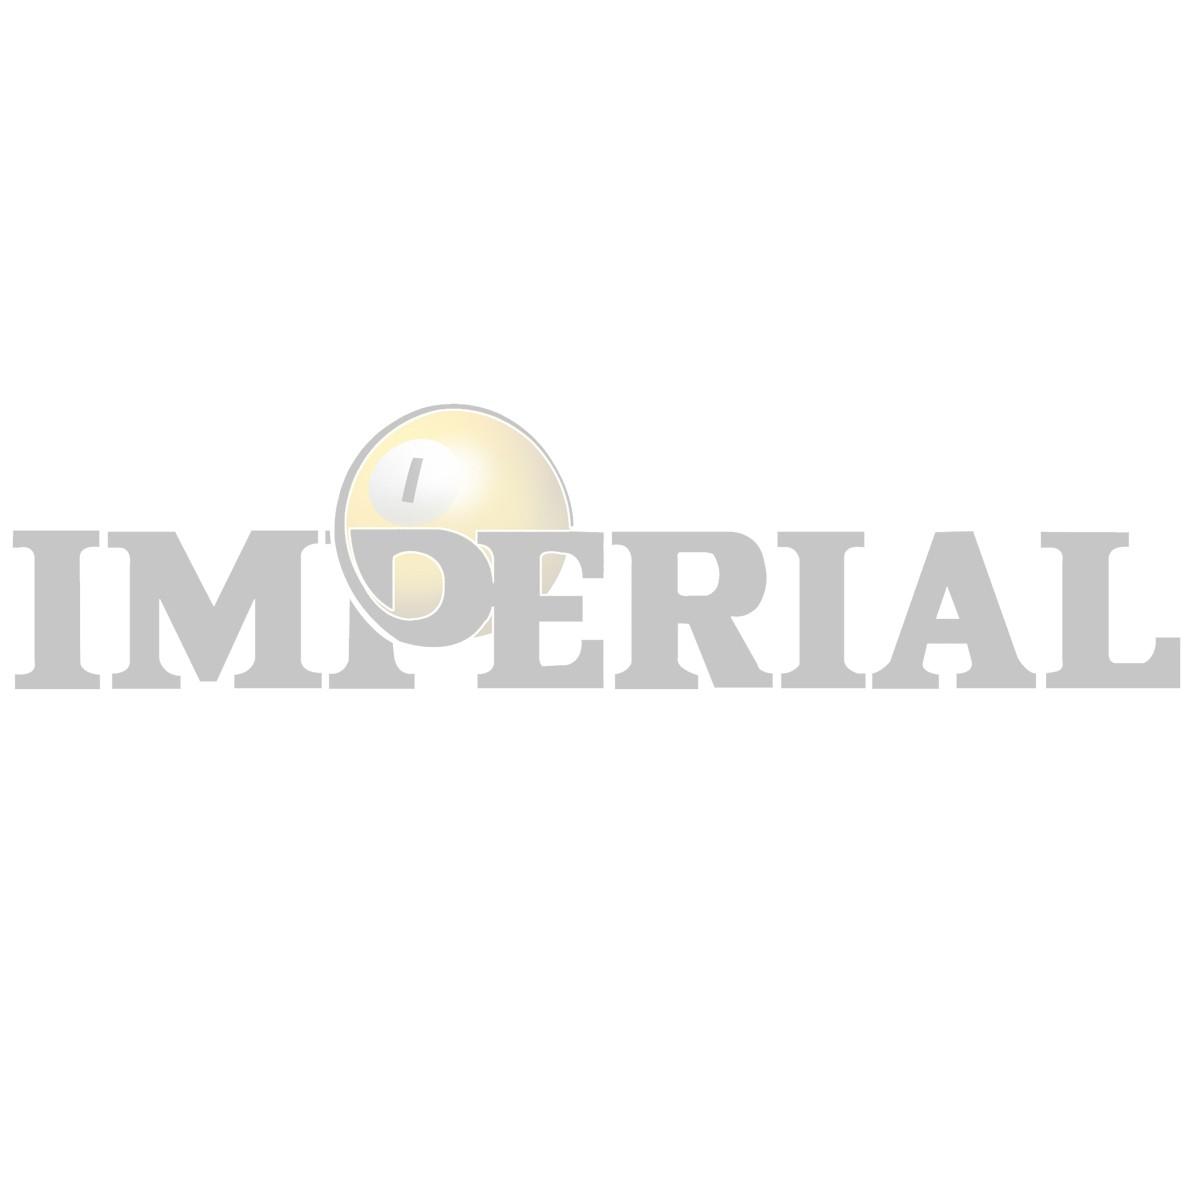 University of Iowa Home vs. Away Billiard Ball Set